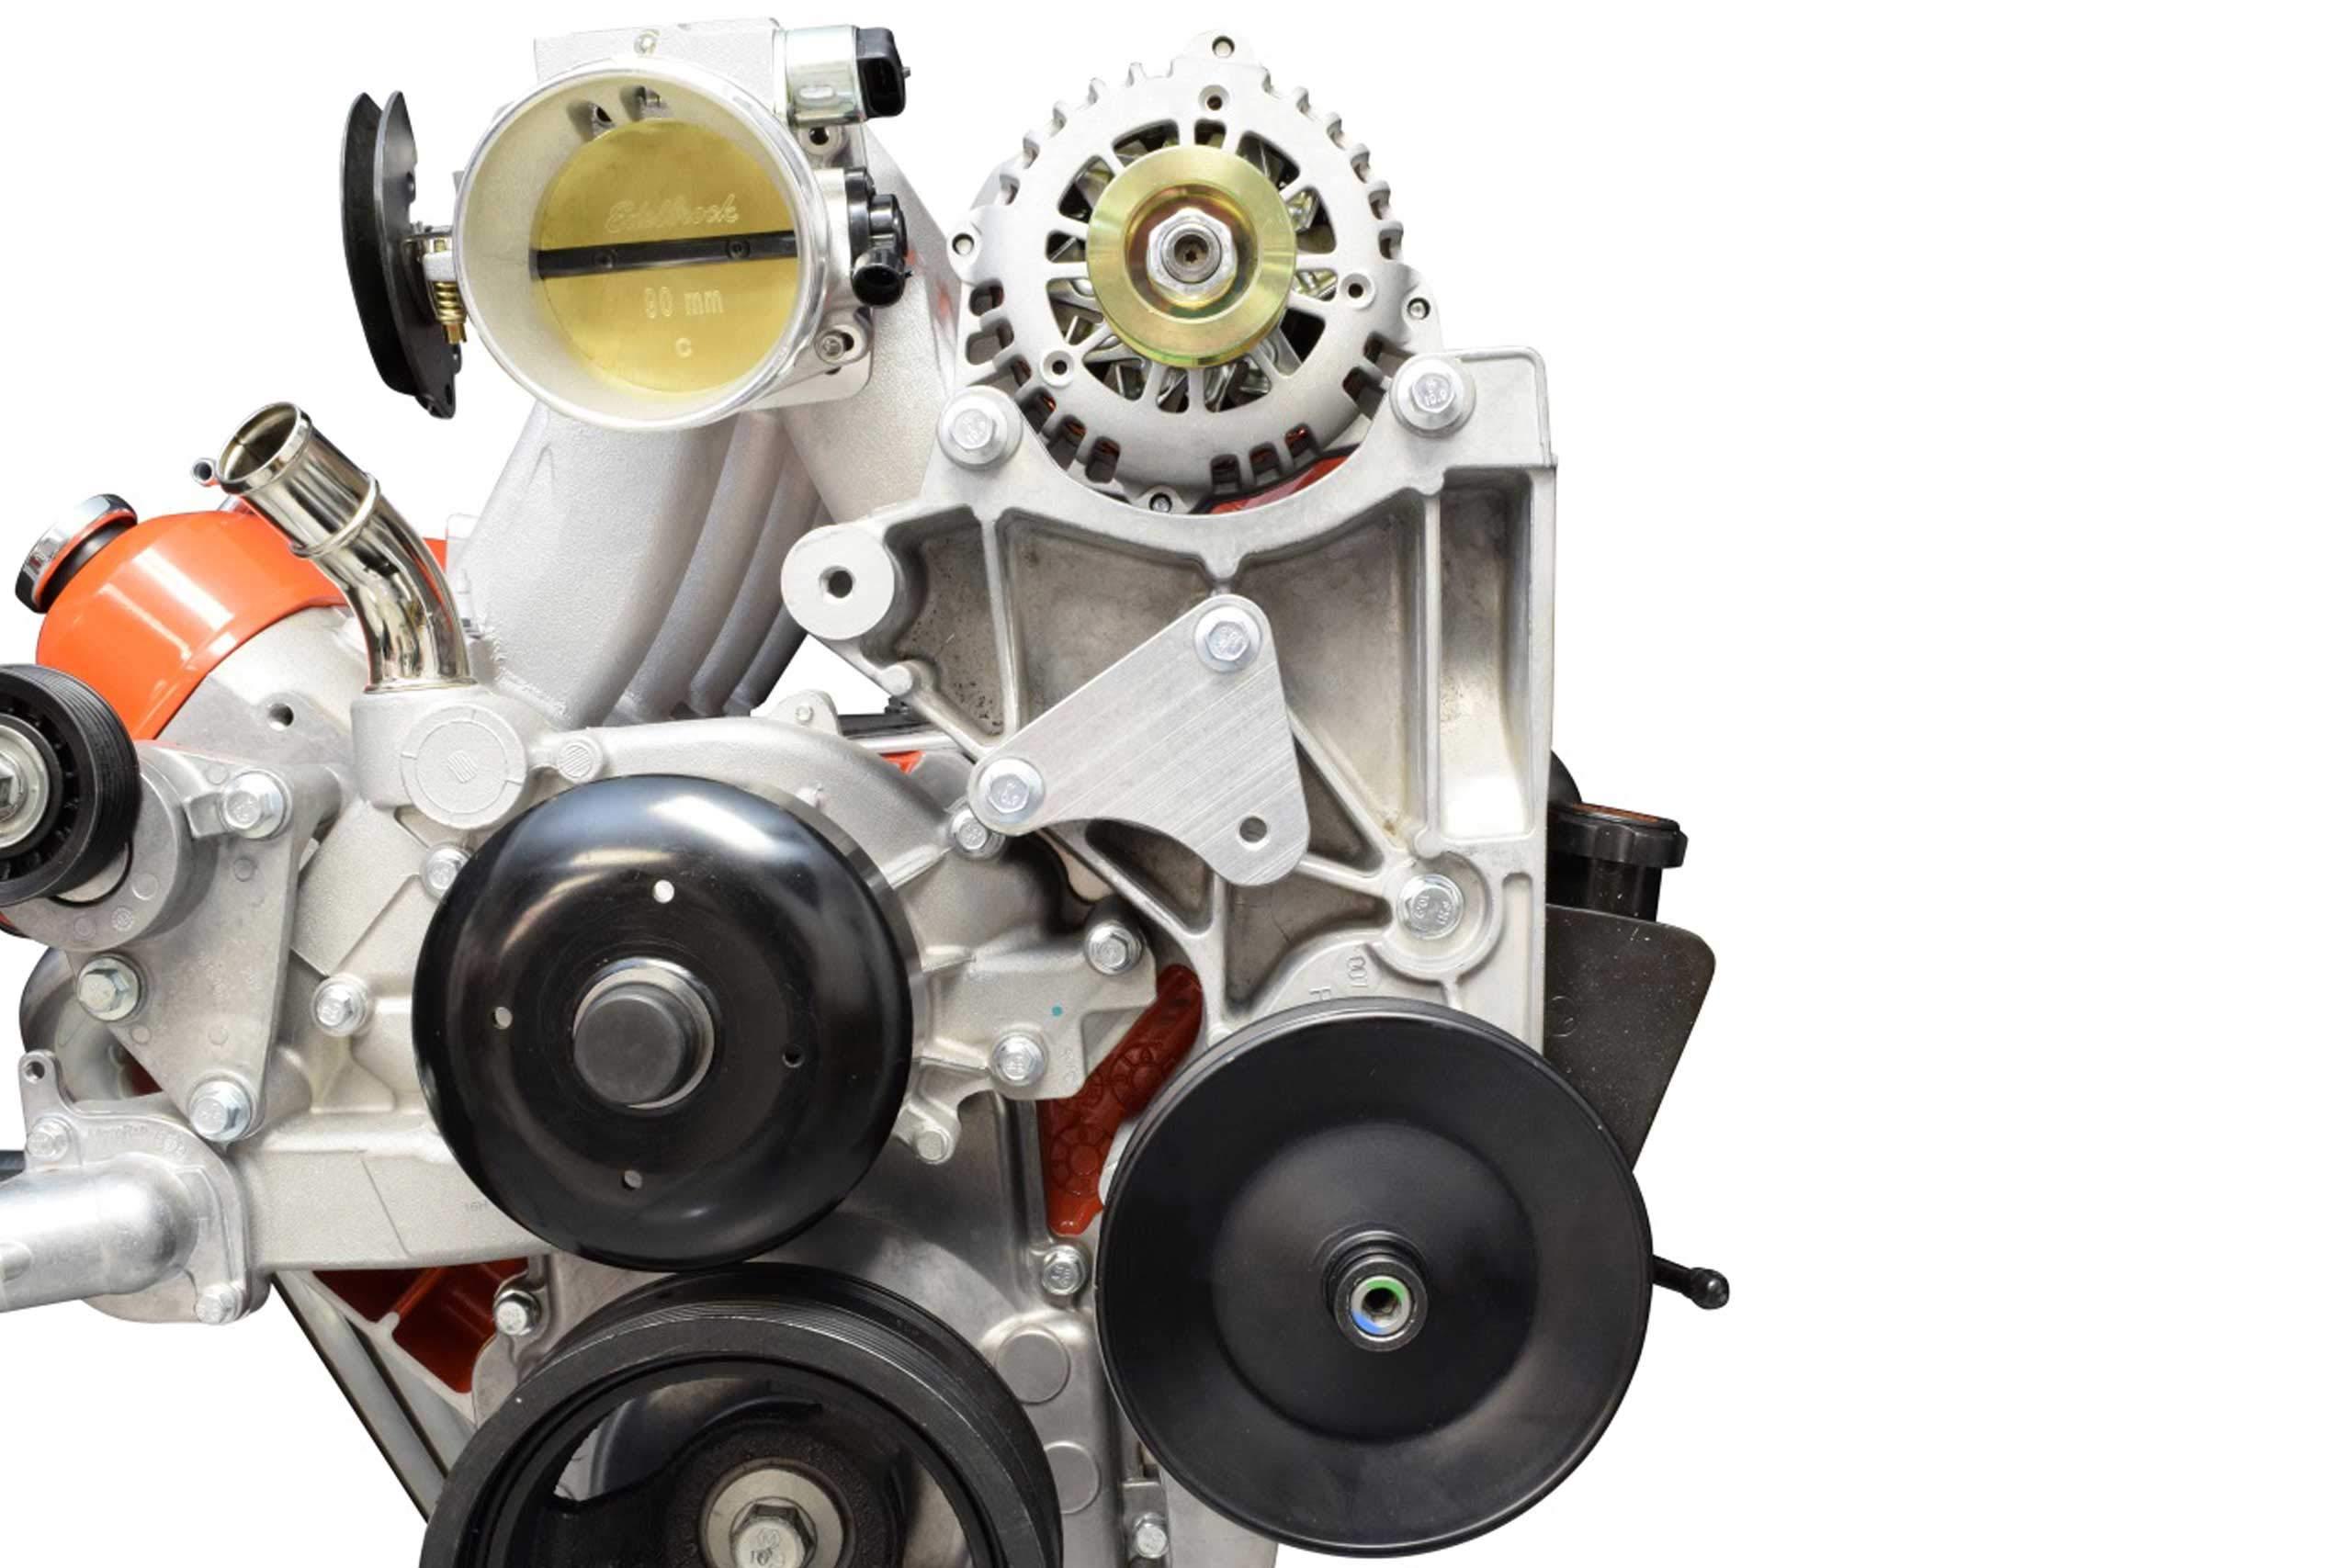 ICT Billet LS Idler Pulley Relocation Bracket for LS1 Intake Swap LQ4 LQ9 LSX 4.8L 5.3L 6.0L Truck Bracket Alternator Power Steering 551353 Billet Aluminum Made in USA